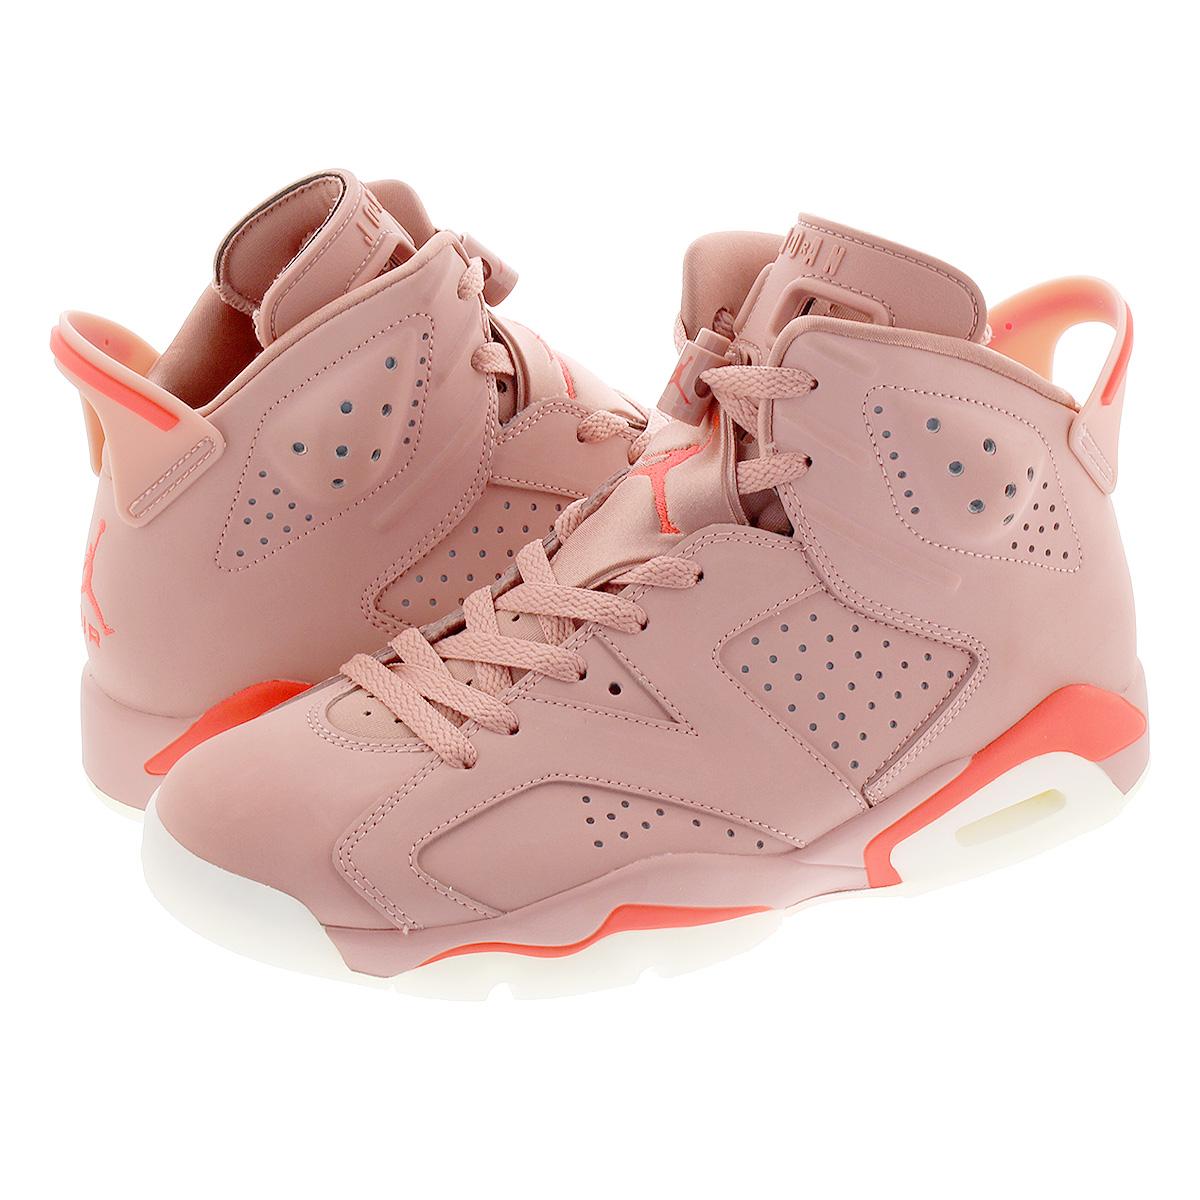 new style 4ee2e 90c06 NIKE WMNS AIR JORDAN 6 RETRO NRG Nike women Air Jordan 6 nostalgic NRG RUST  PINK/BRIGHT CRIMSON ci0550-600